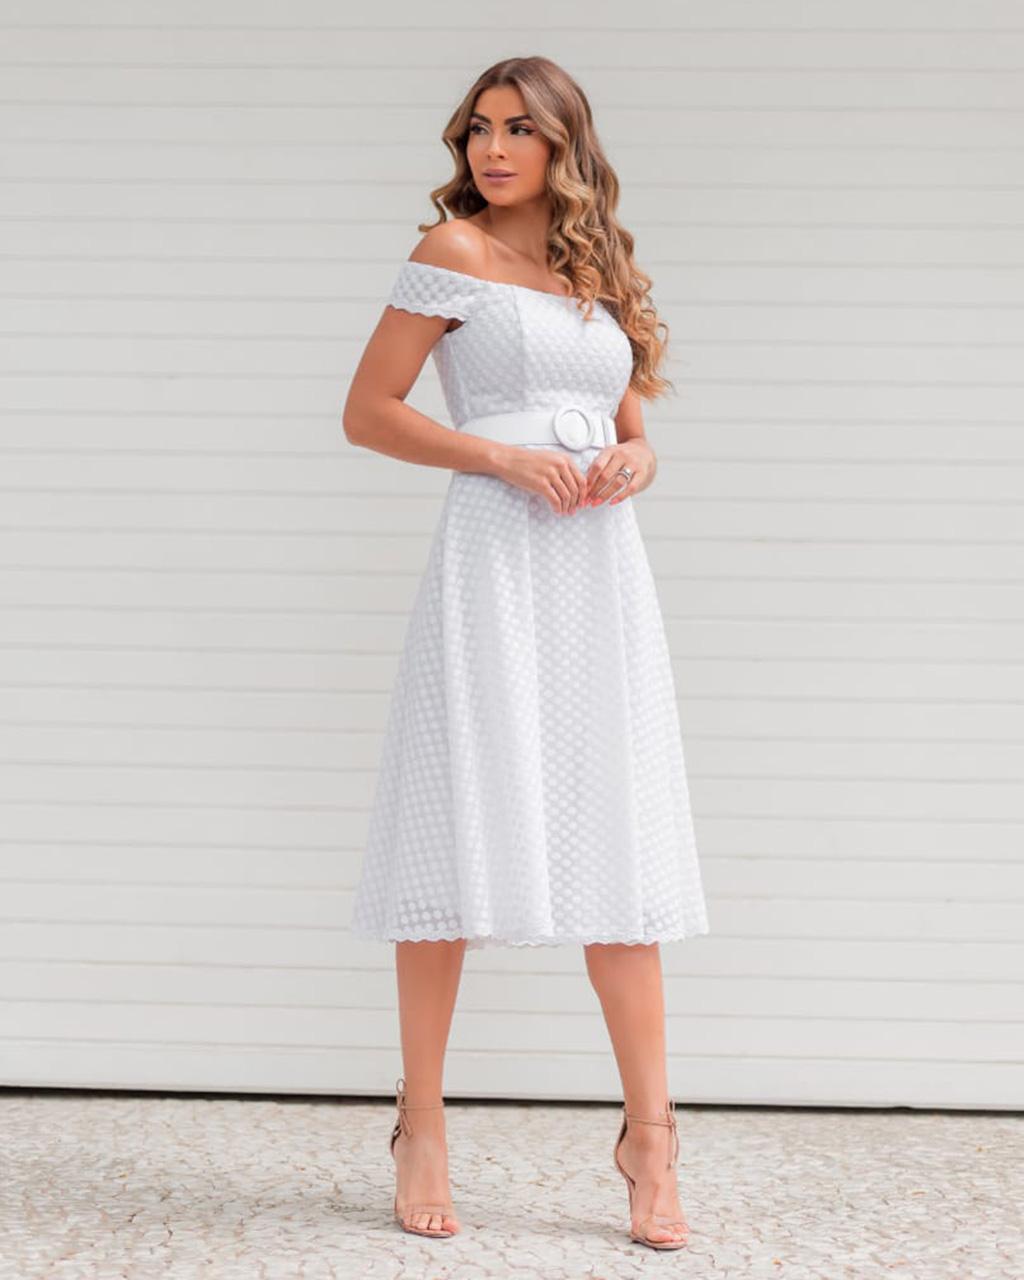 Vestido Andreia  - Empório NM